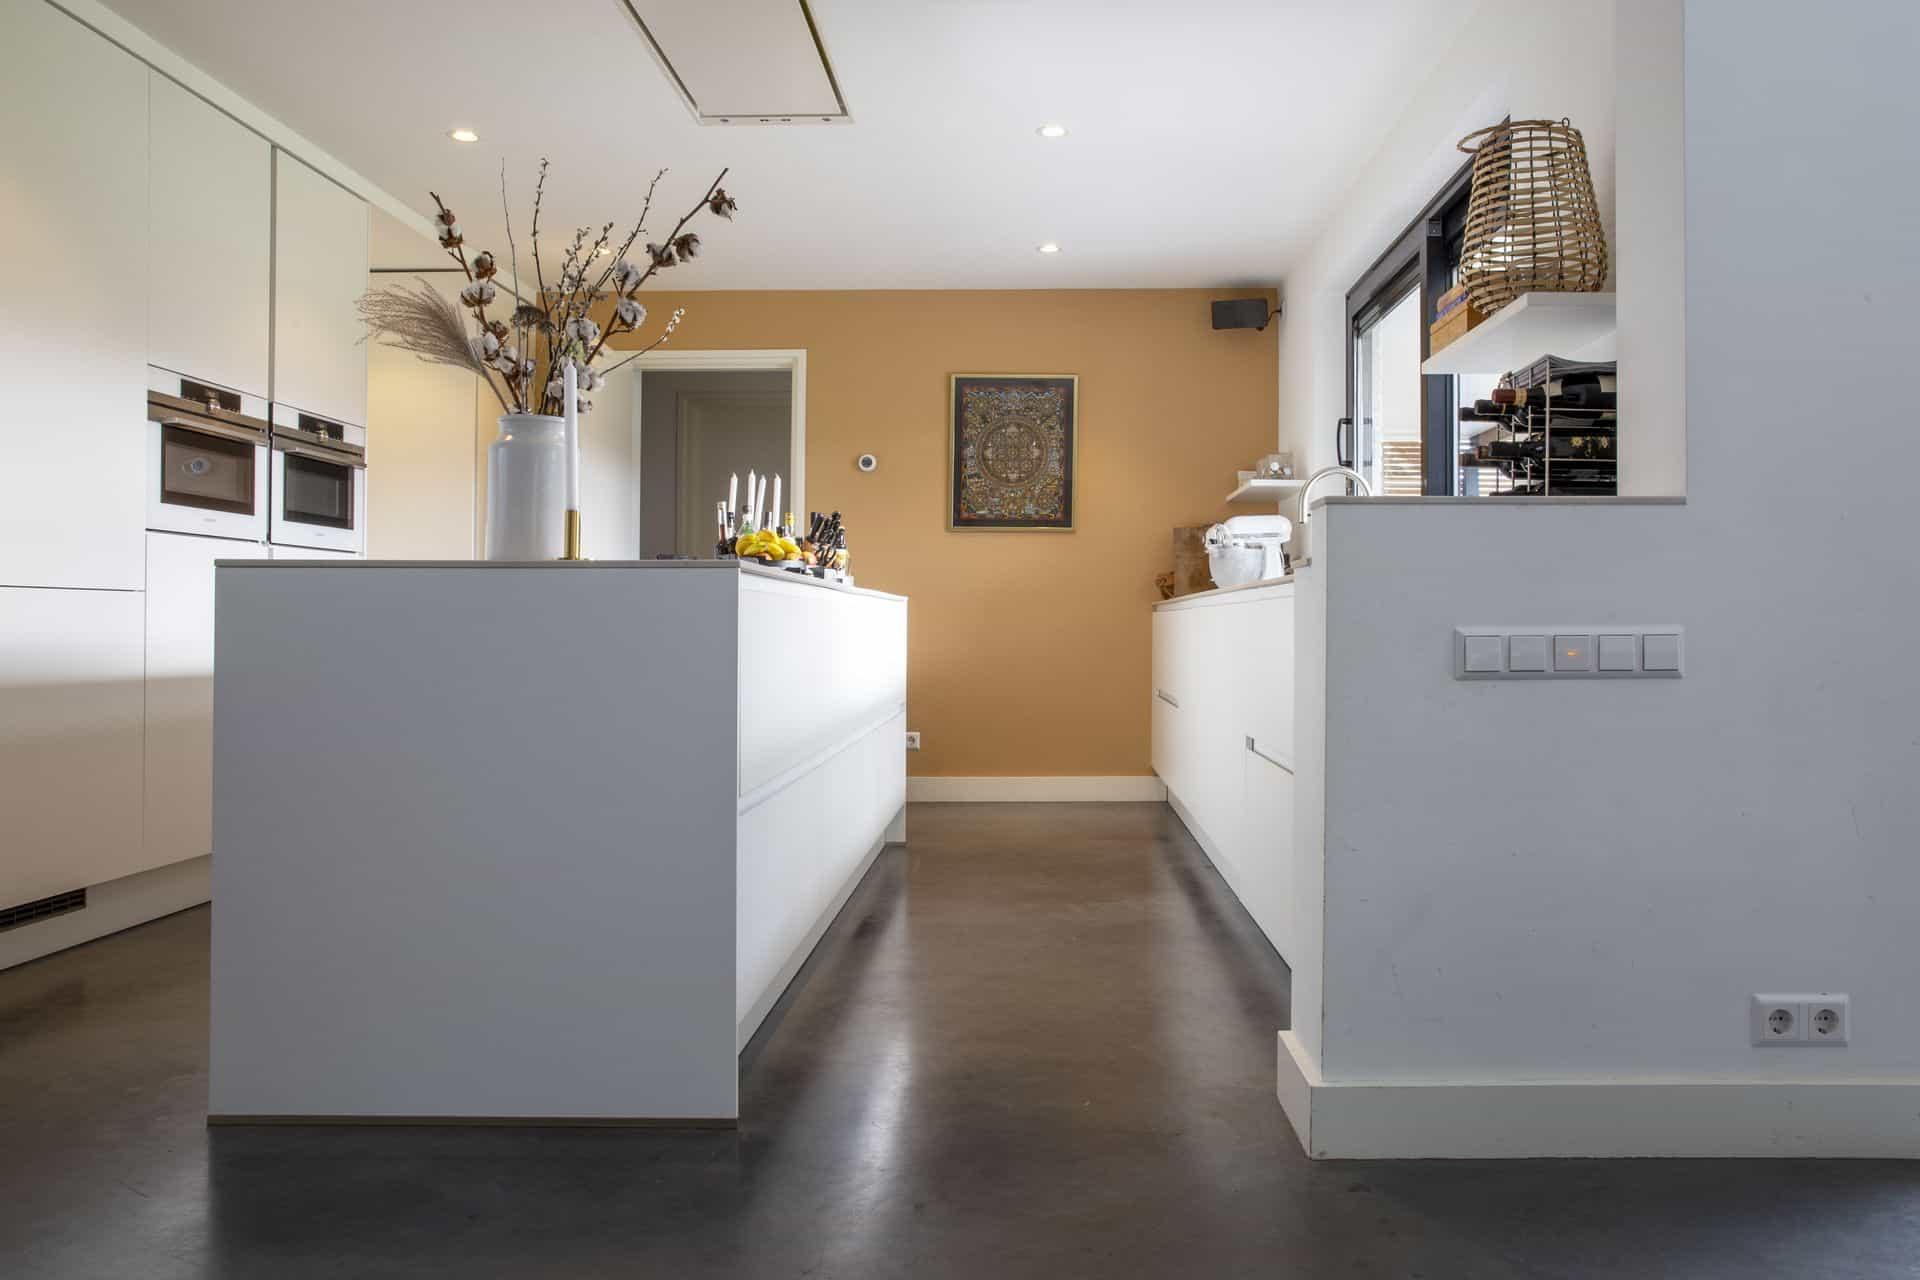 Gevlinderde betonvloer keuken